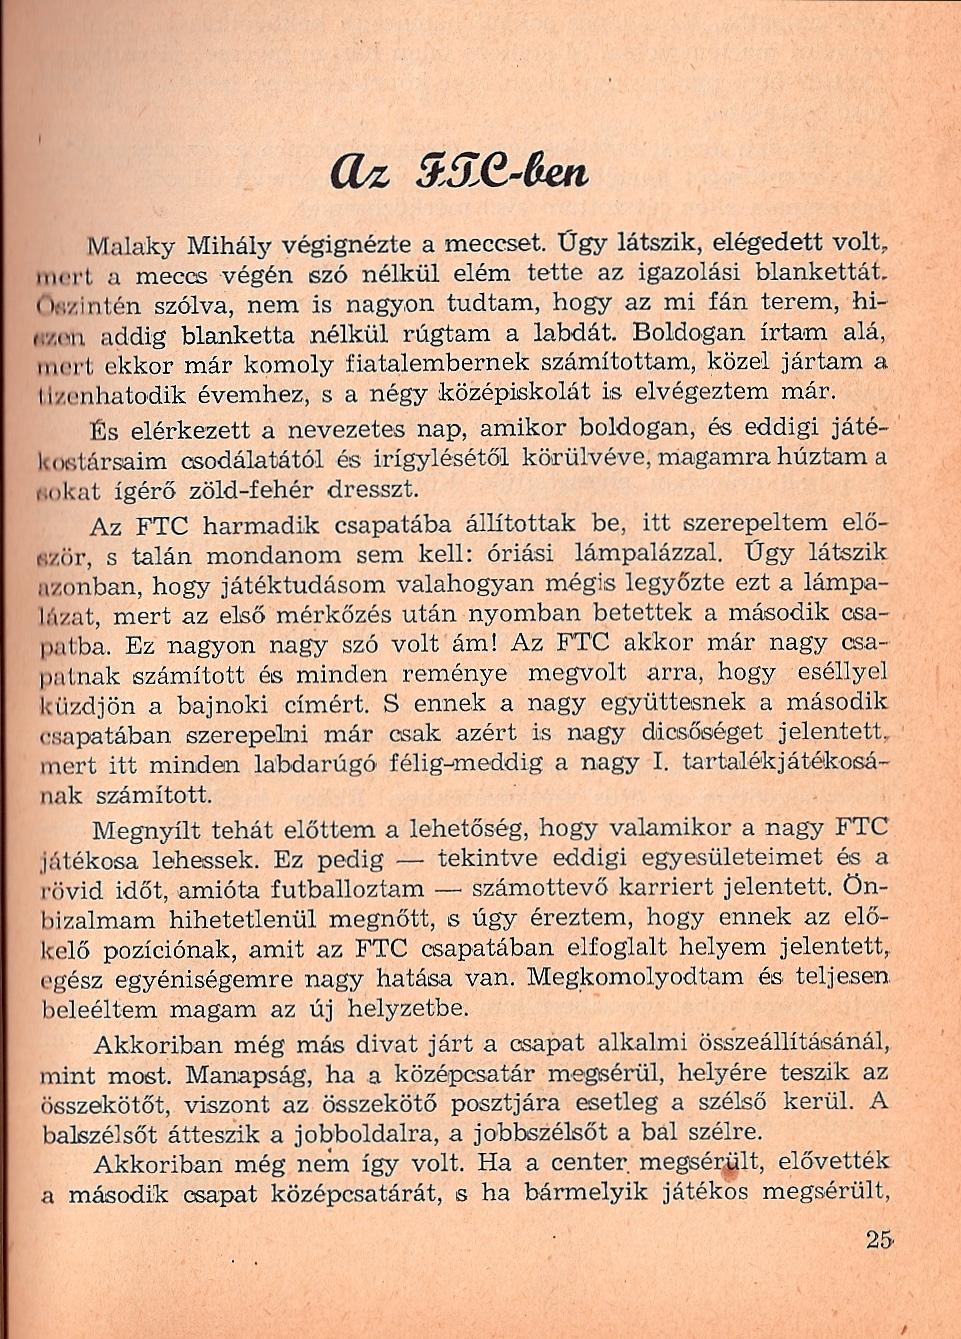 schlosser_fel-evszazad_1957_25_1020